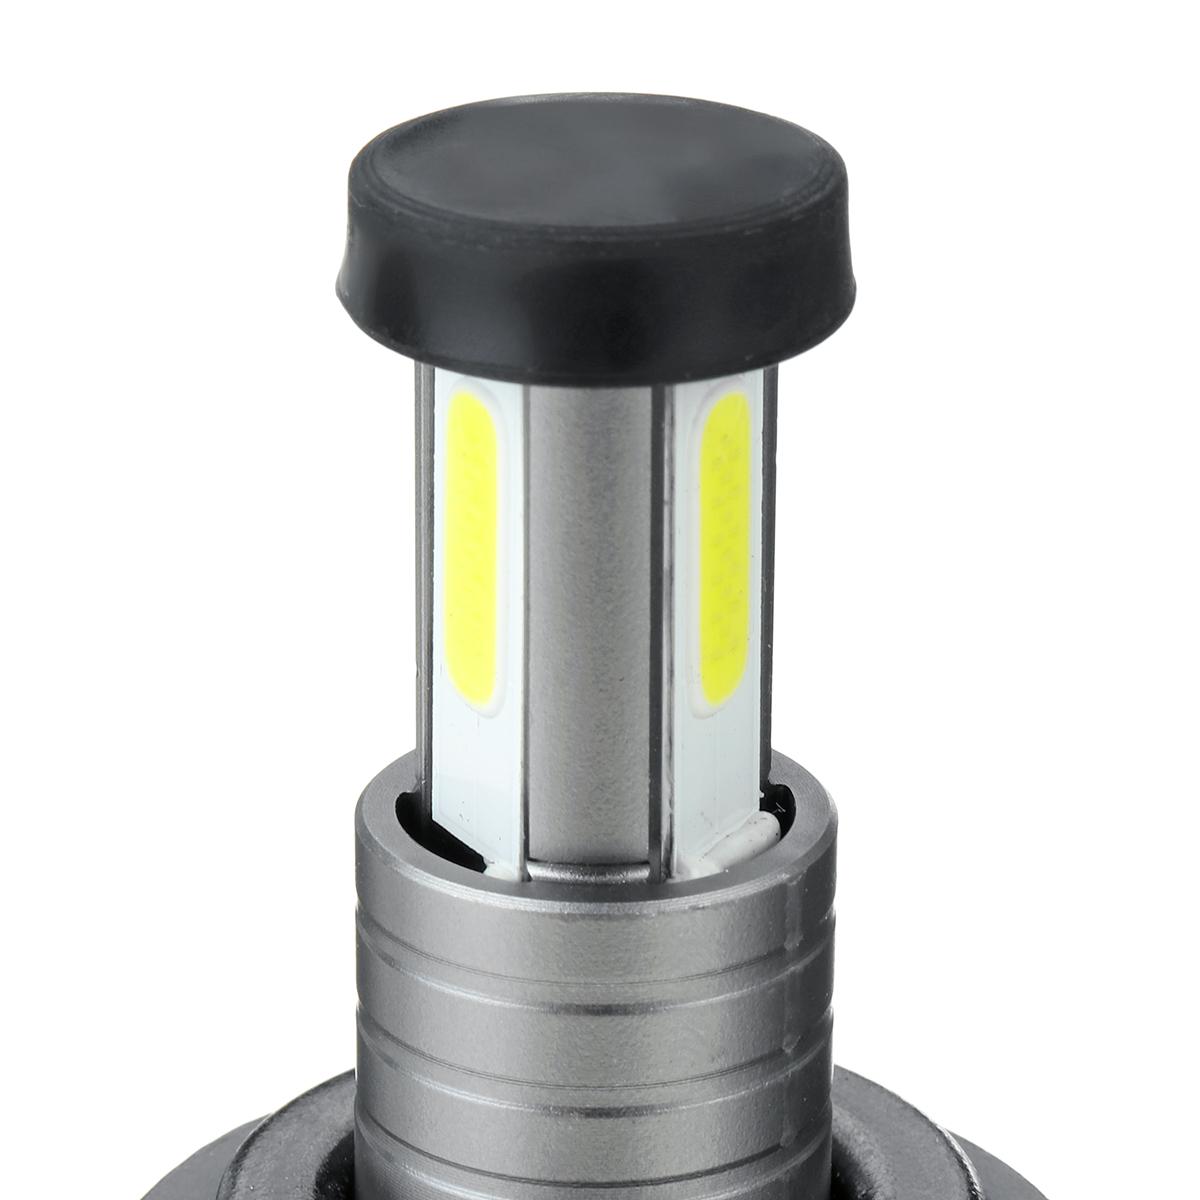 TXVSO8 X3 LED Car Headlights Bulbs H7 H8 H9 H11 9012 9006 9005 Fog Lights 120W 30000LM 6000K White Waterproof 360 Degree Lighting 12V 24V